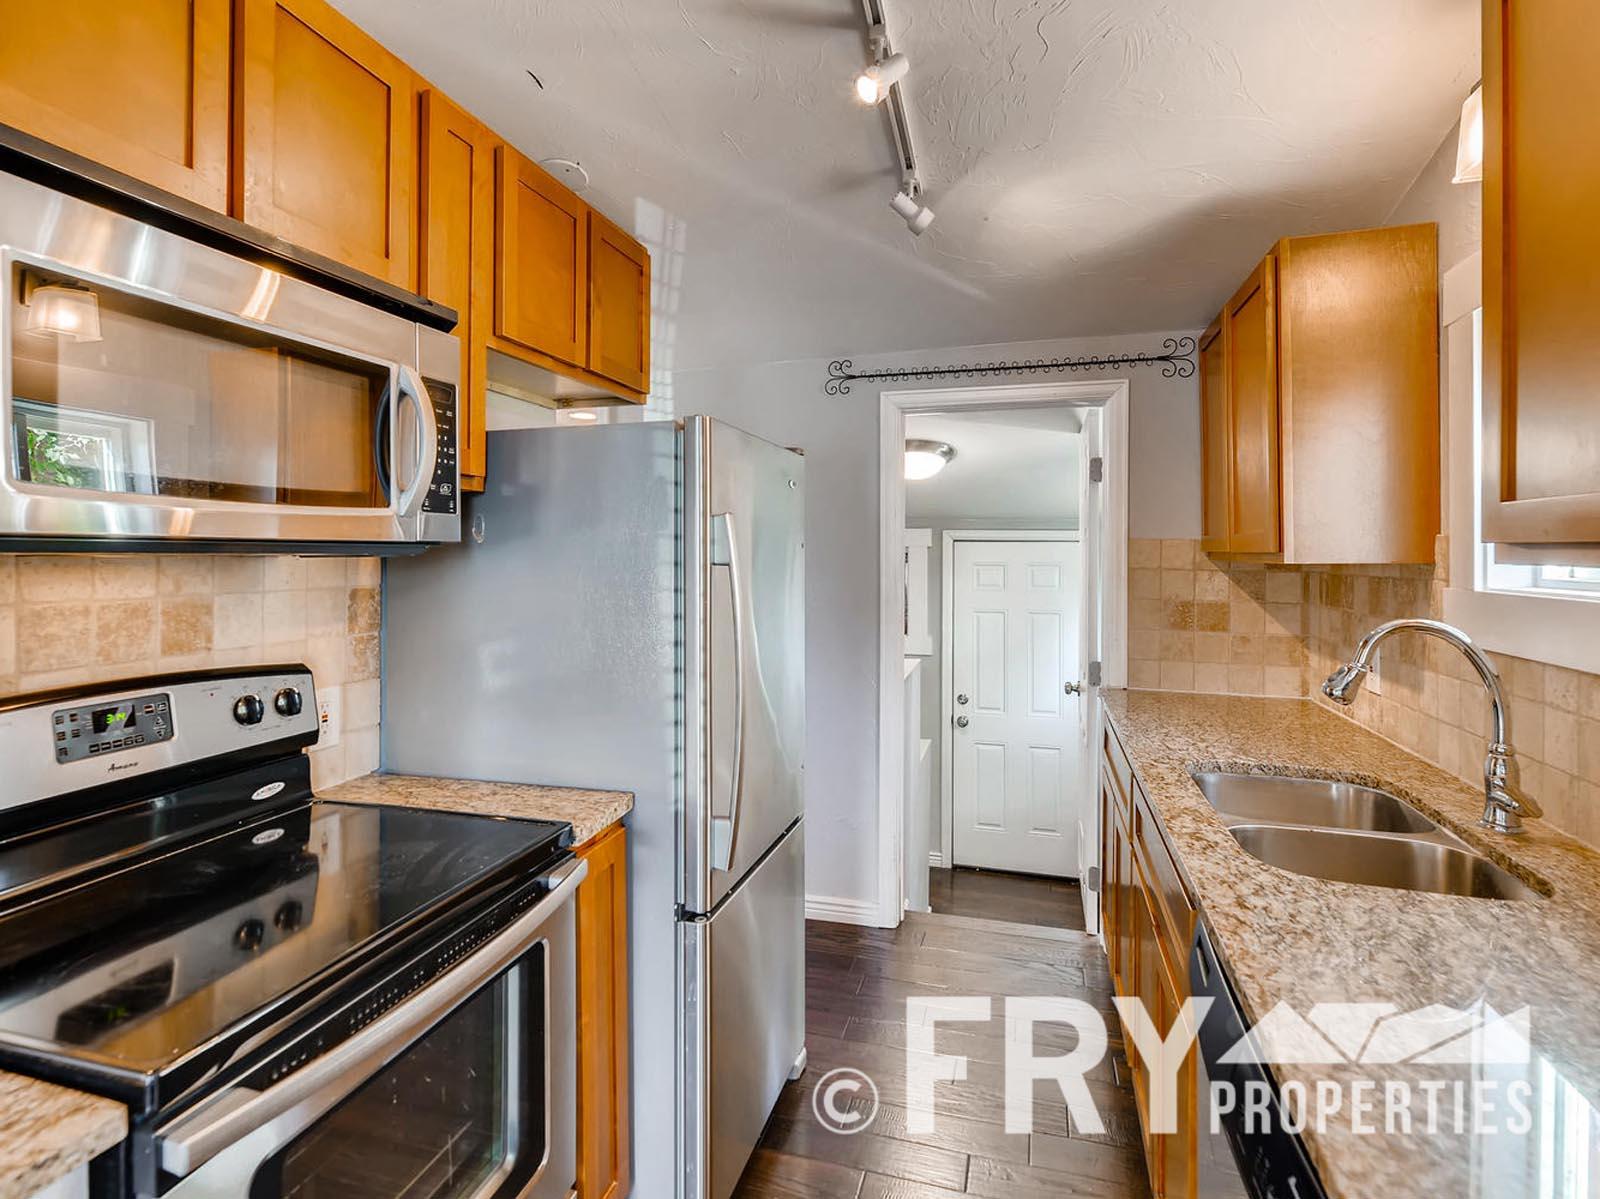 2808 S Delaware Street-large-010-22-Kitchen-1499x1000-72dpi